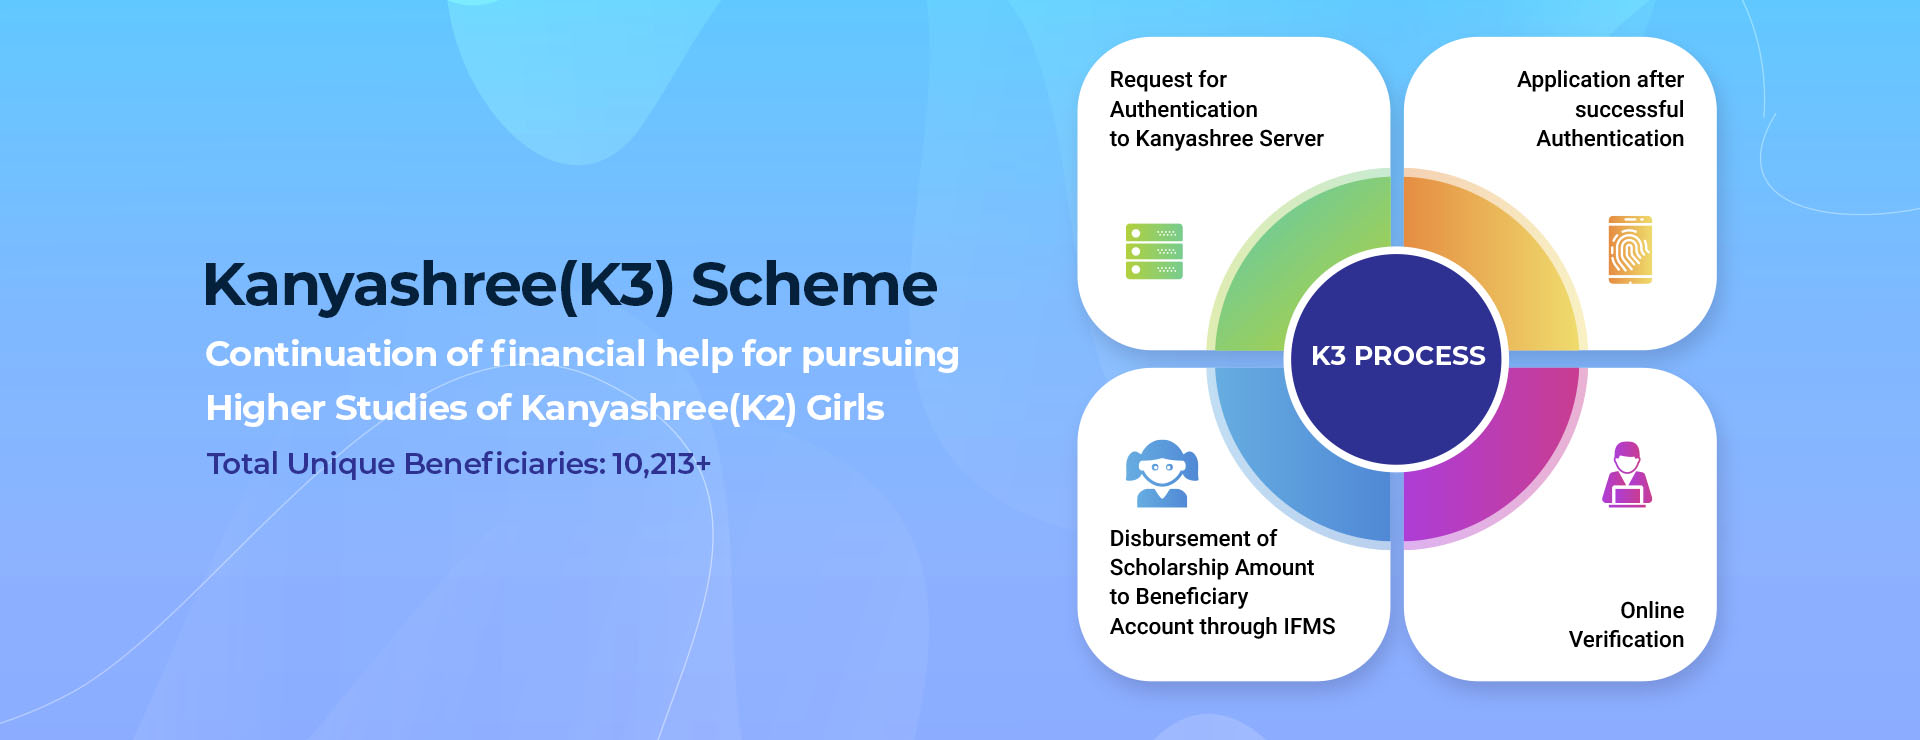 Kanyashree(K3) Scheme